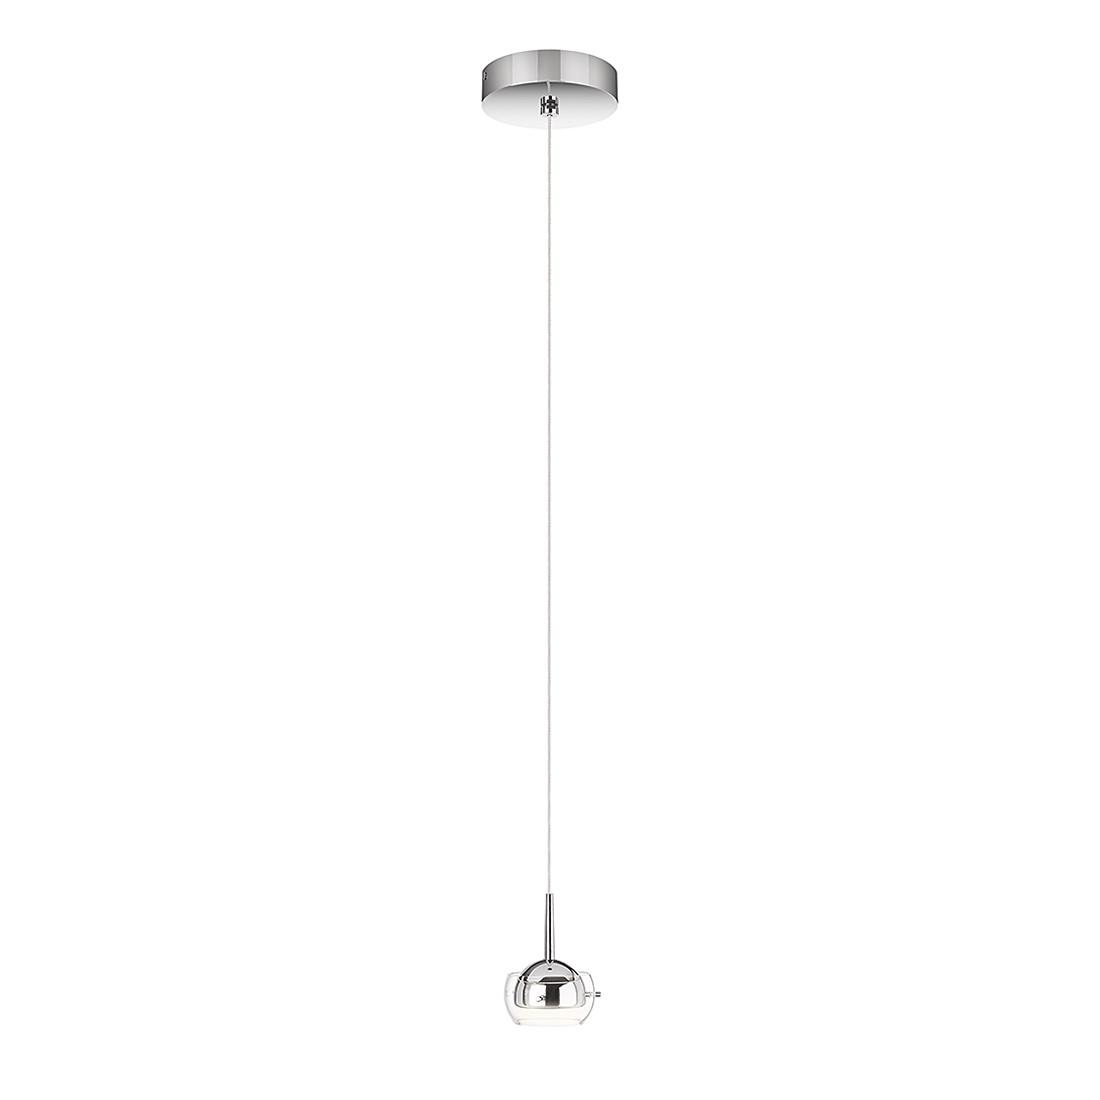 EEK A+, LED-Pendelleuchte myLiving Cypress I – Chrom – 1-flammig, Philips günstig kaufen